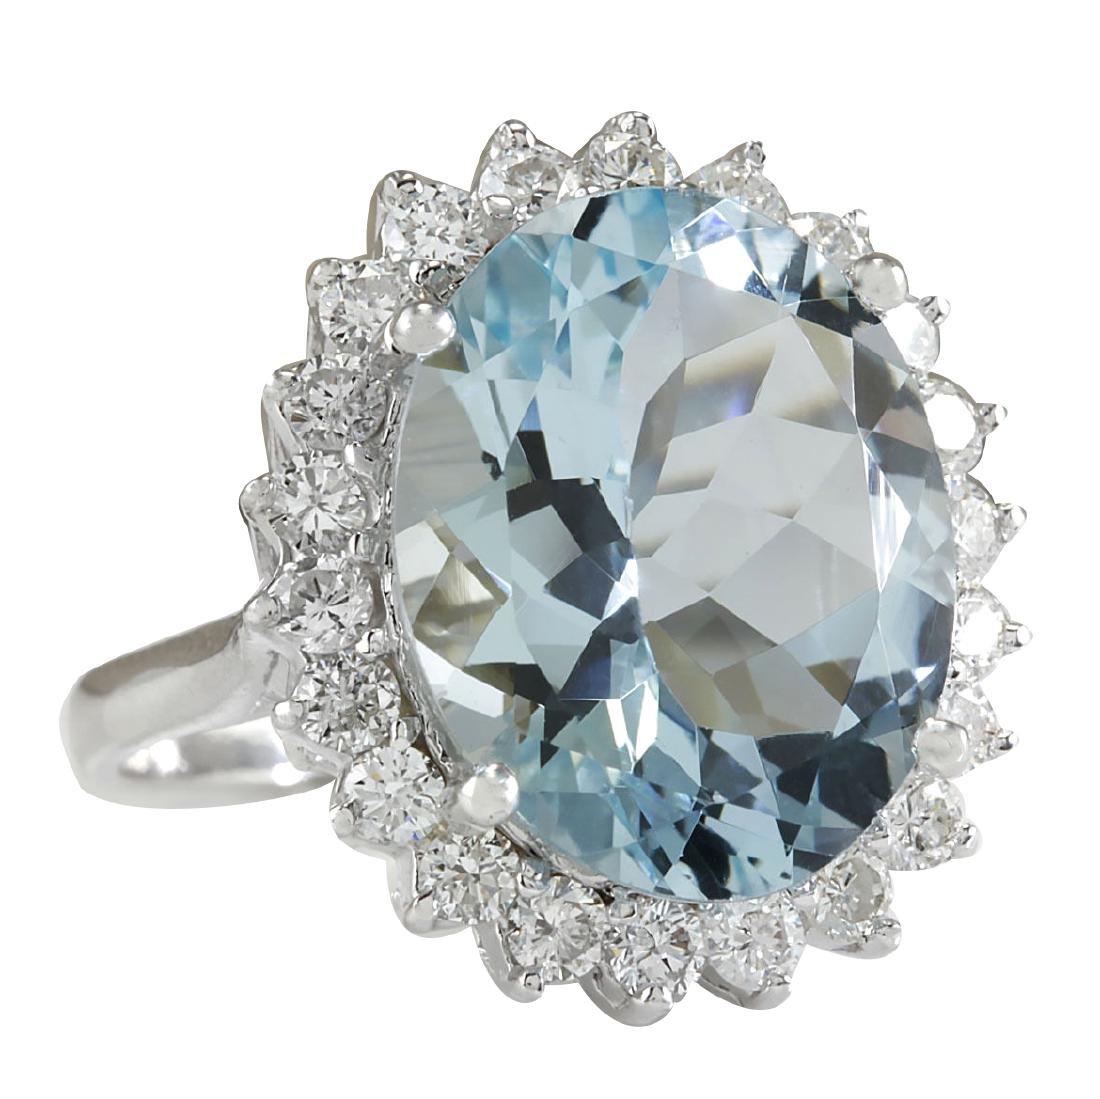 8.10CTW Natural Aquamarine And Diamond Ring In 18K - 2